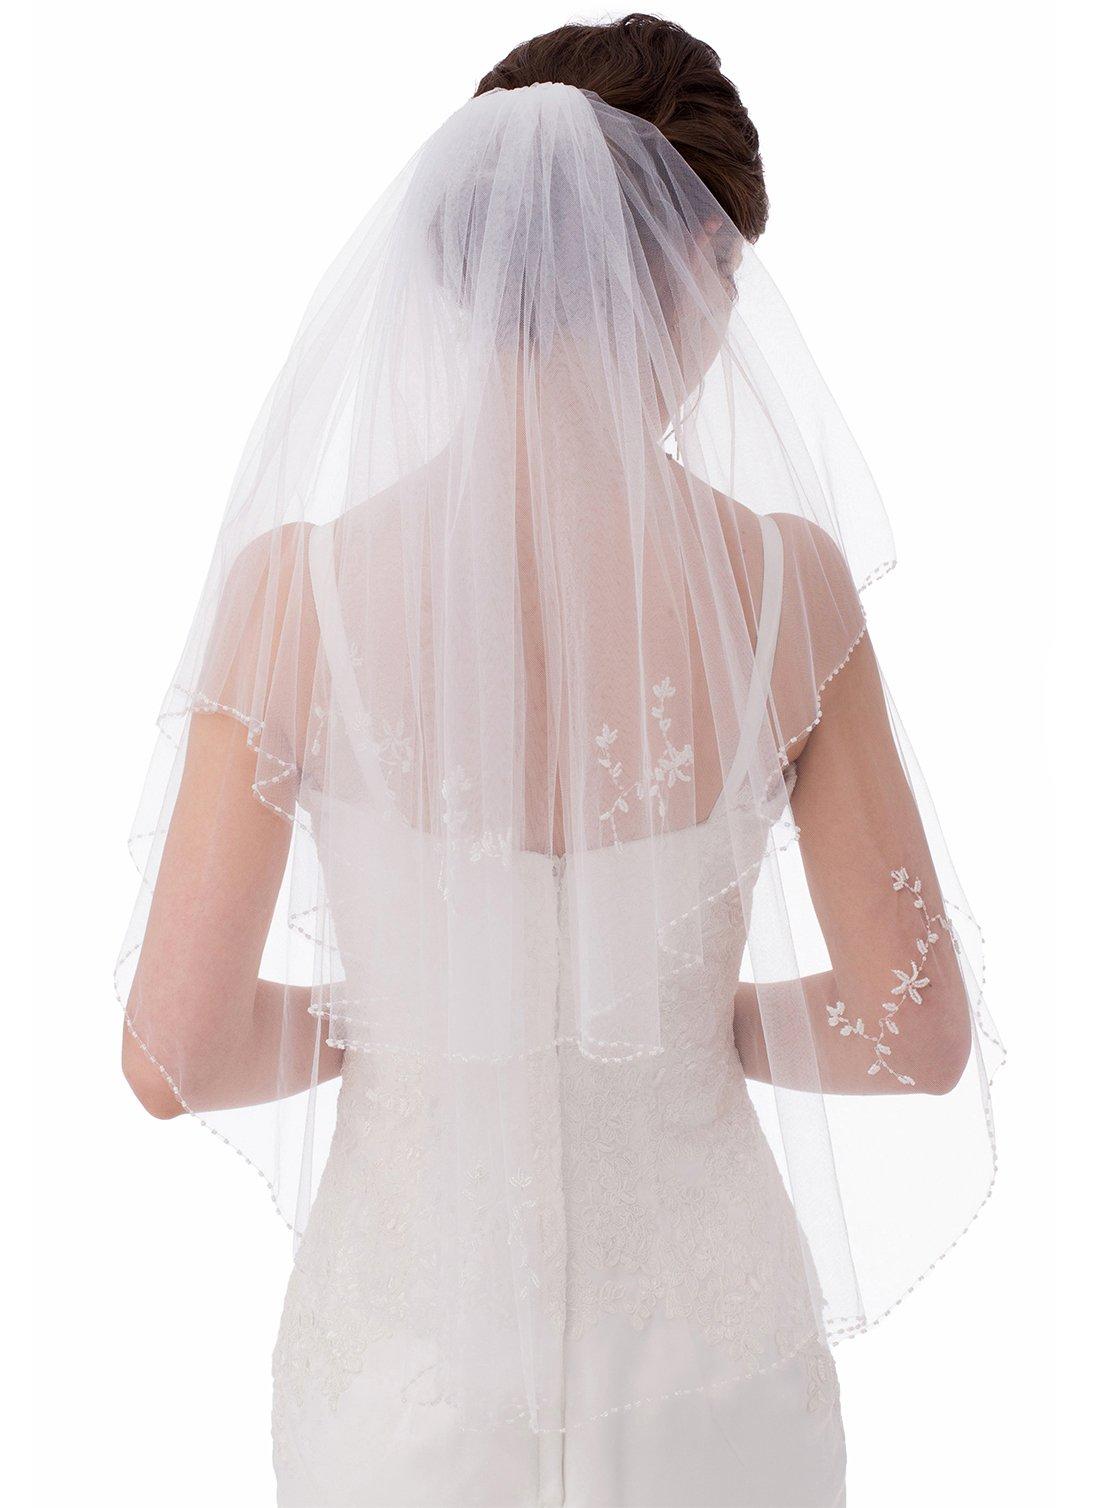 Emondora 2T Short Sequin Pearl Edge Crystals Beaded Bling Wedding Bridal Veil Ivory